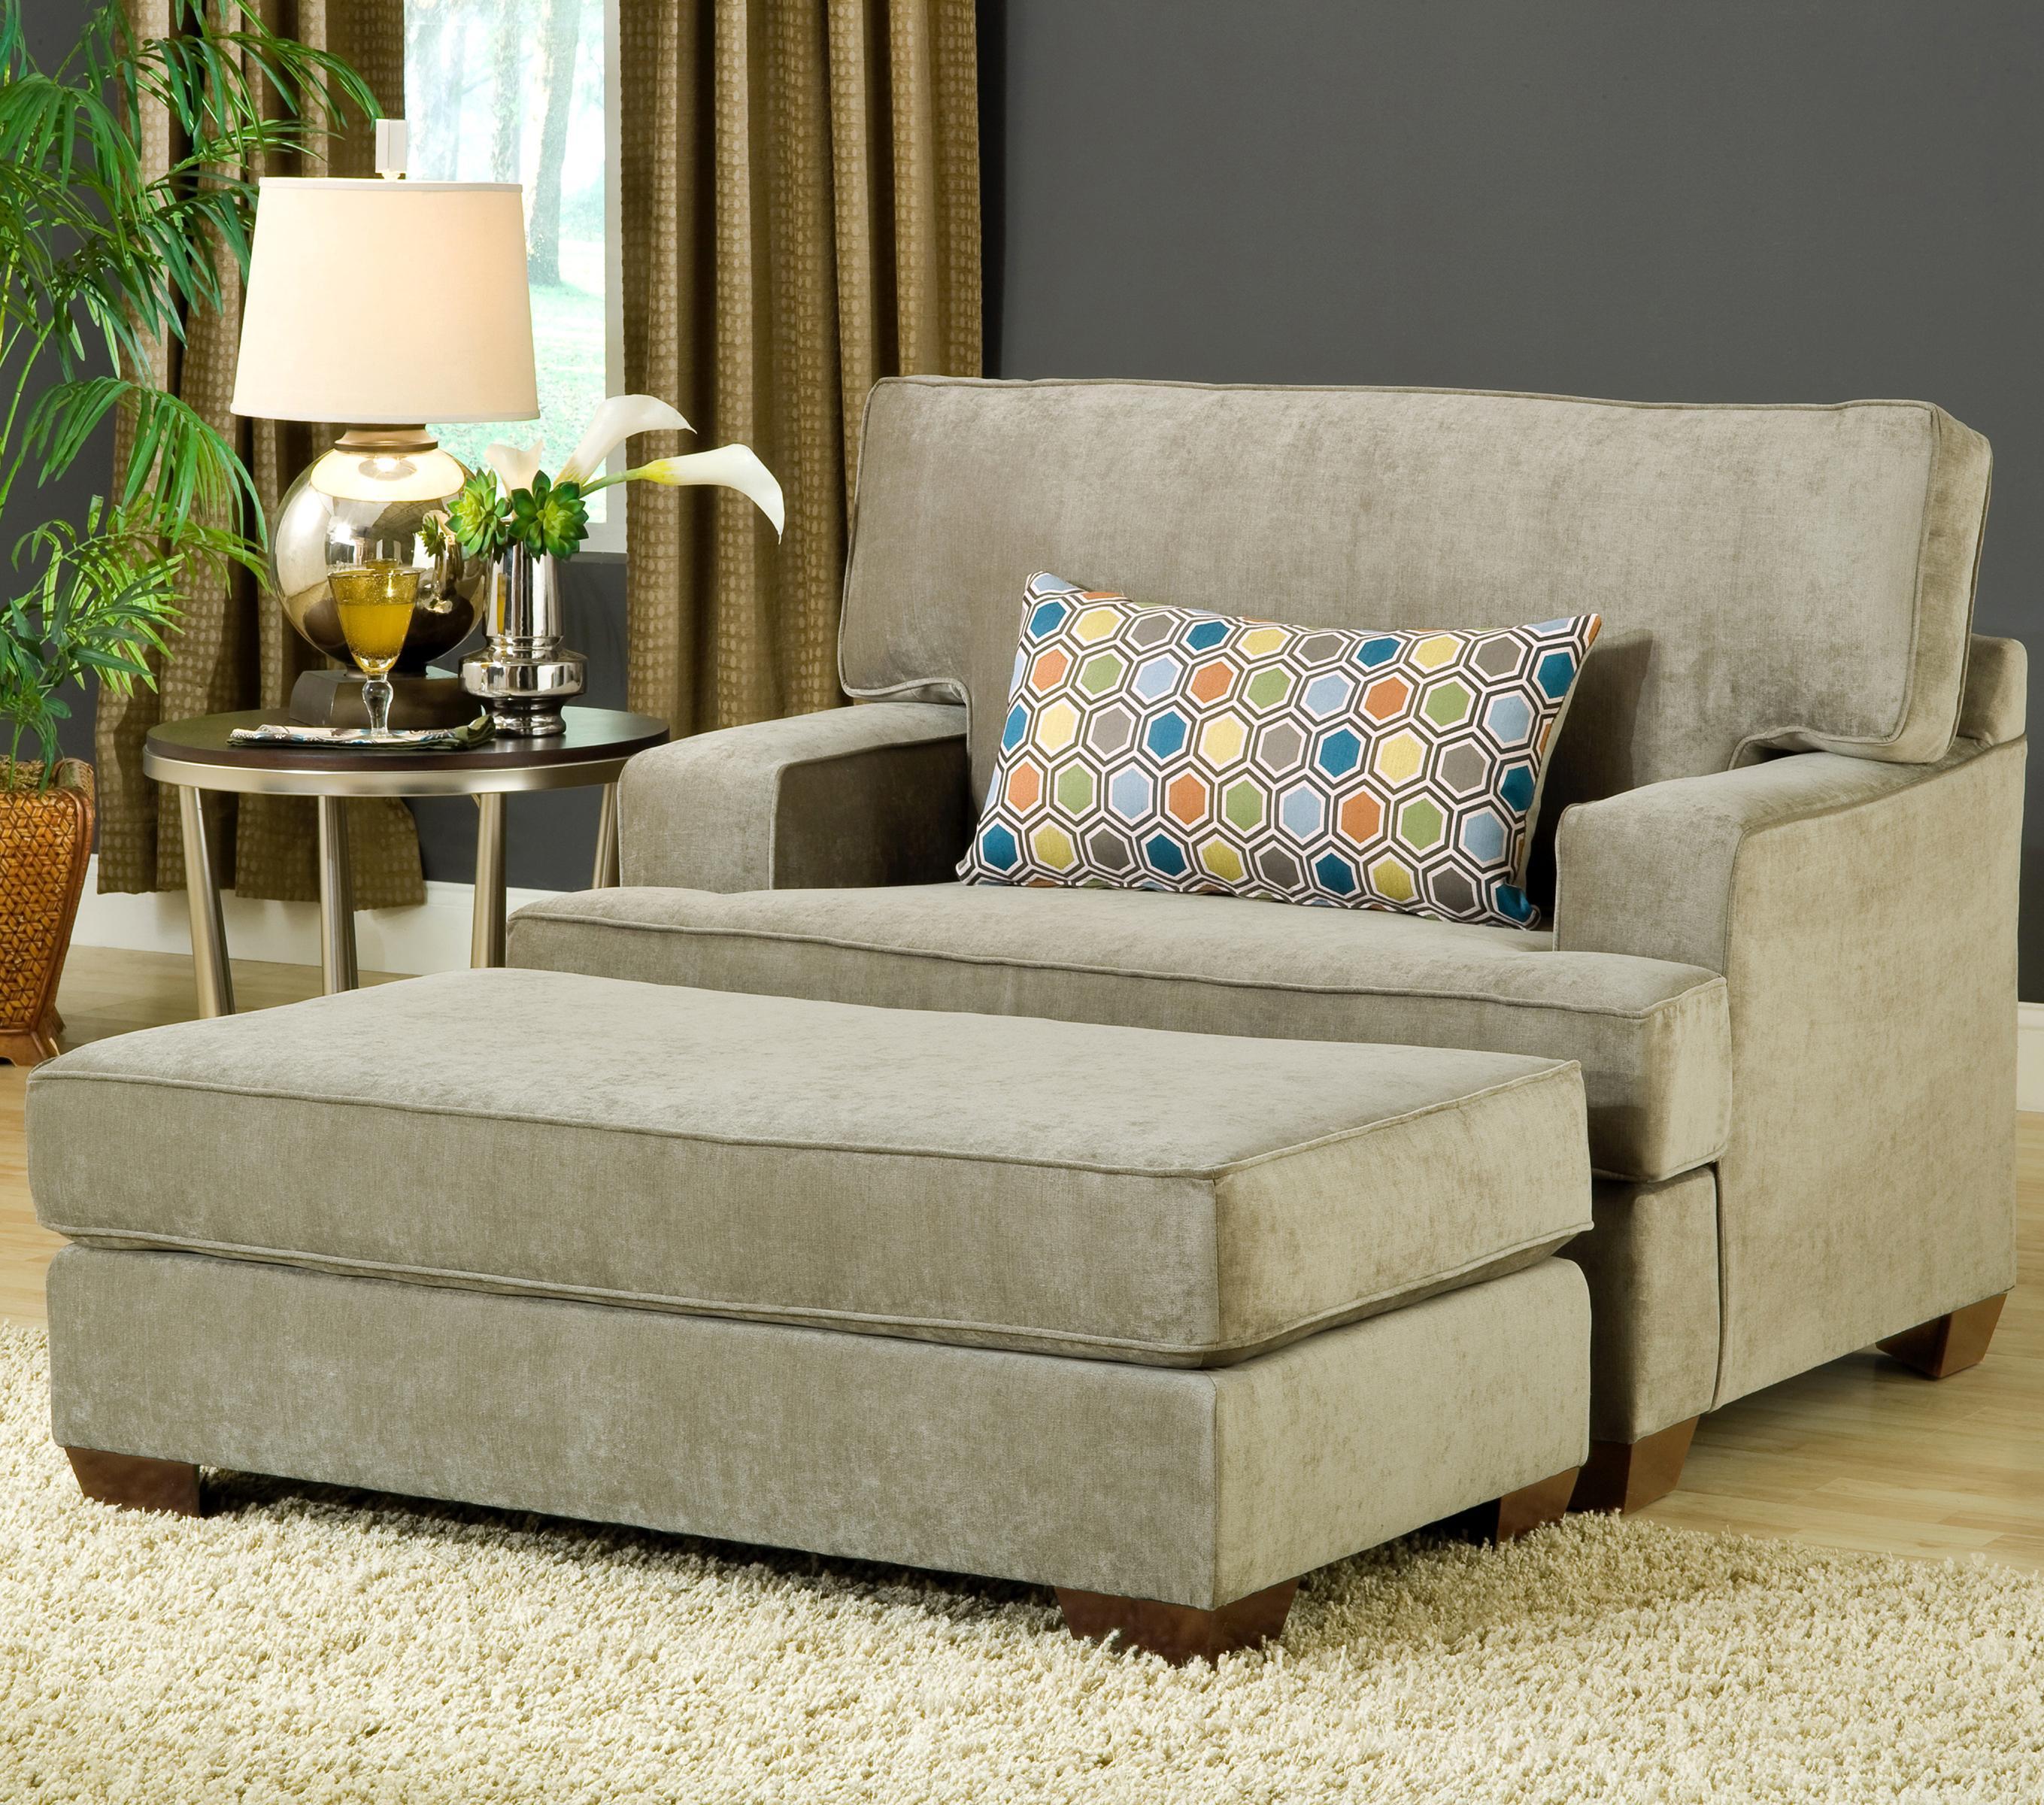 Belfort Essentials Daniel Chair and Ottoman - Item Number: 5900-10+OO